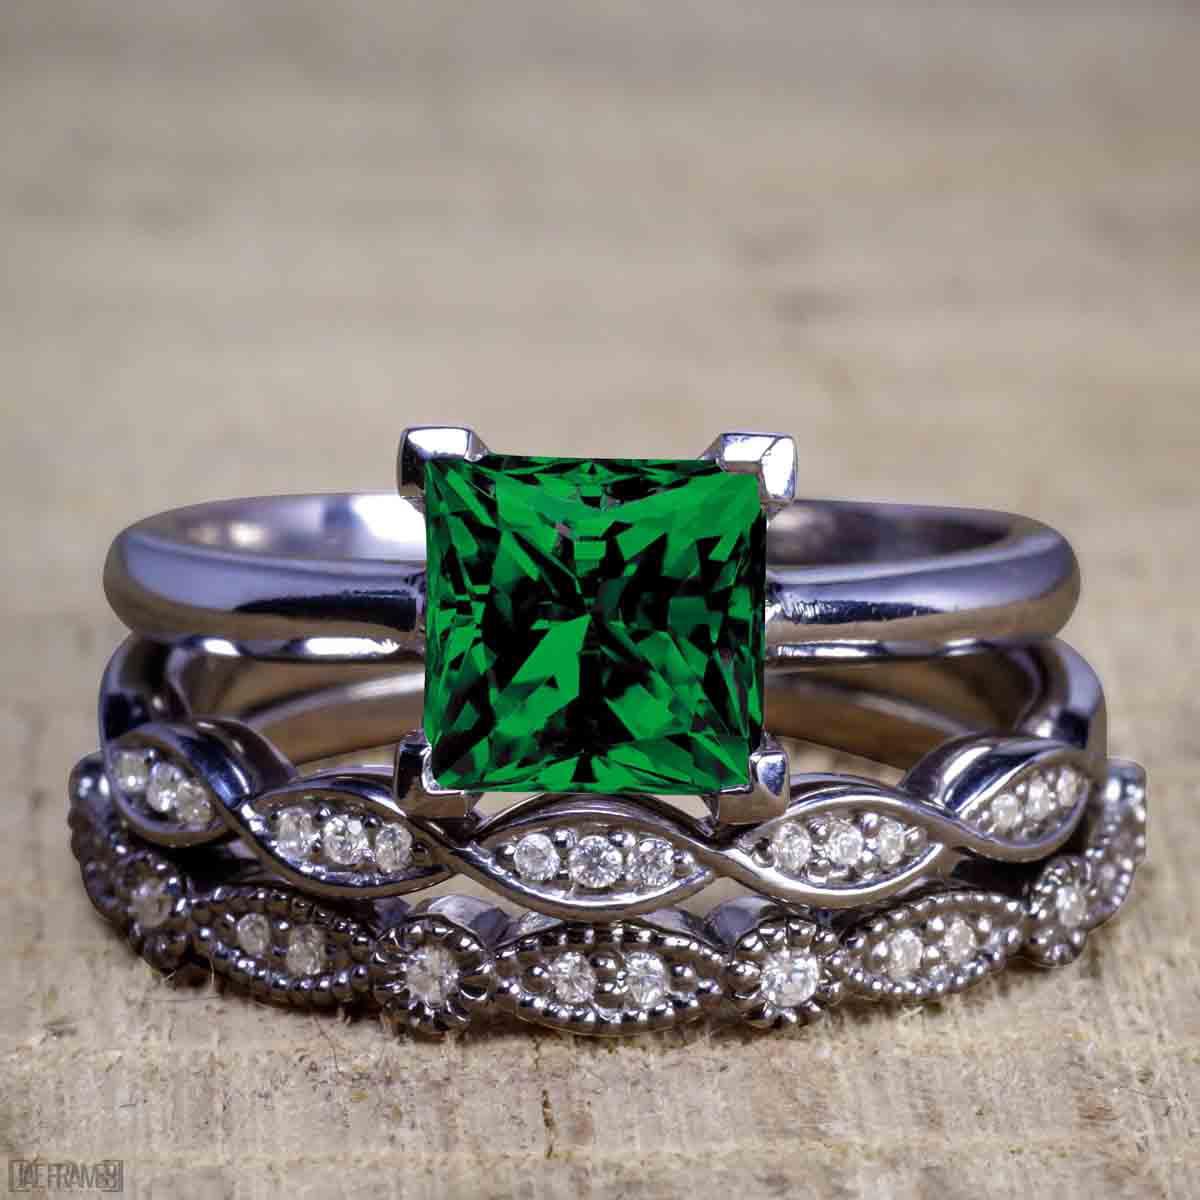 Bestselling 150 Carat Princess Cut Emerald And Diamond Trio Wedding Ring Set In Black Gold: Green Lantern Emerald Wedding Band Set At Websimilar.org